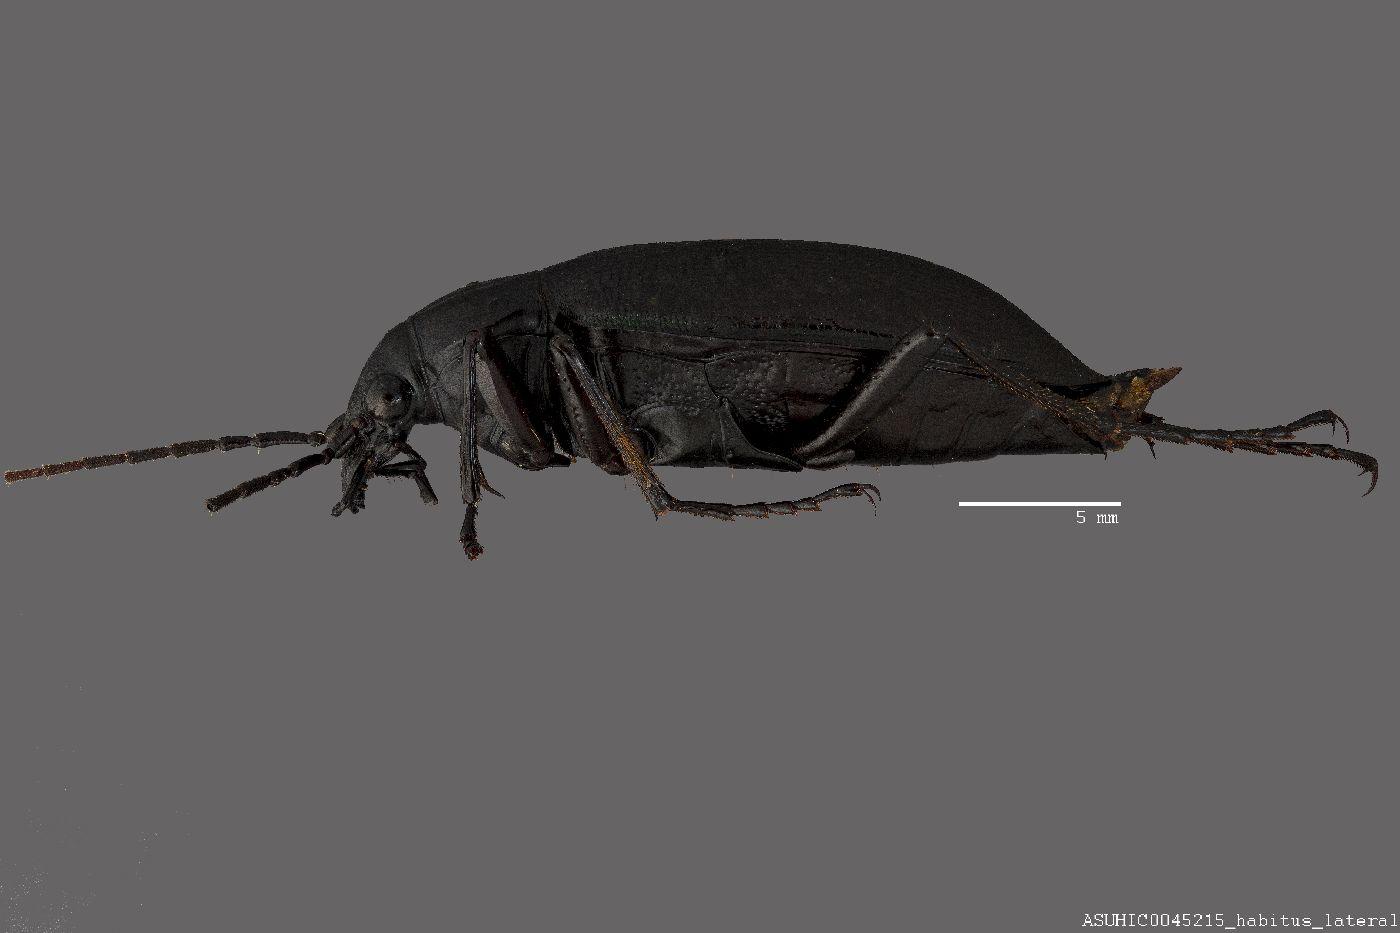 Calosoma image